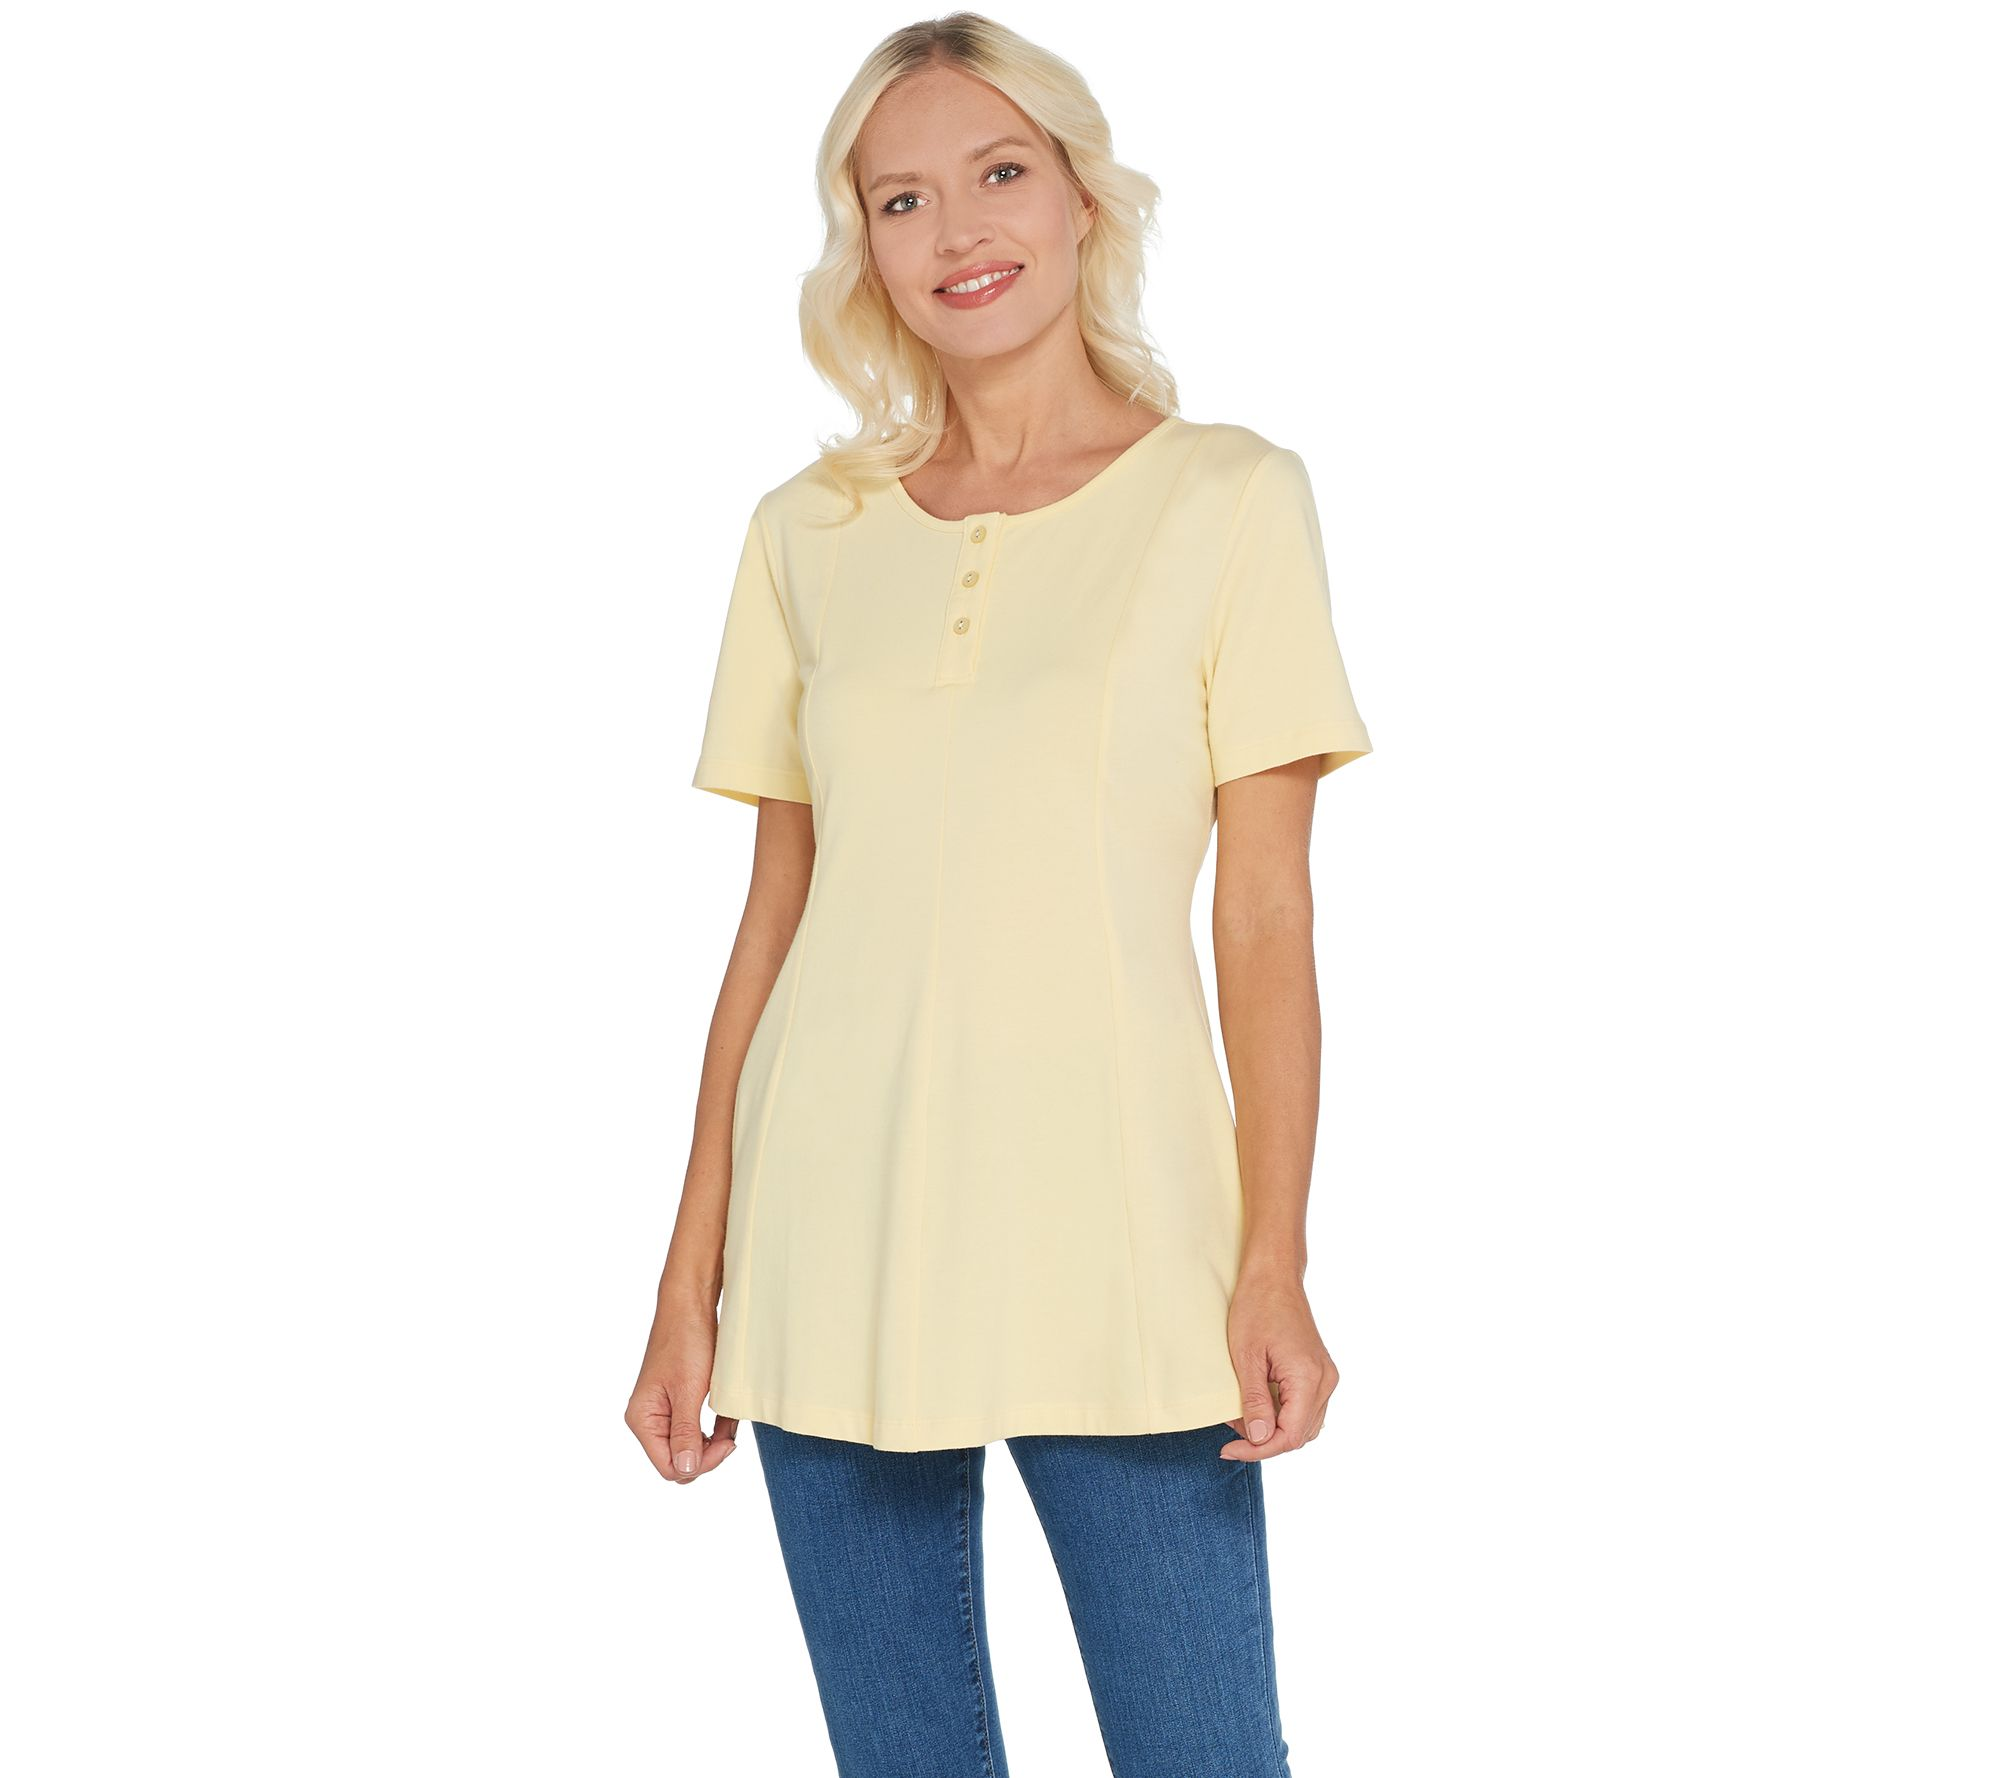 Denim/& Co Essentials Round Neck Fit Flare Henley Knit Top White M NEW A307529